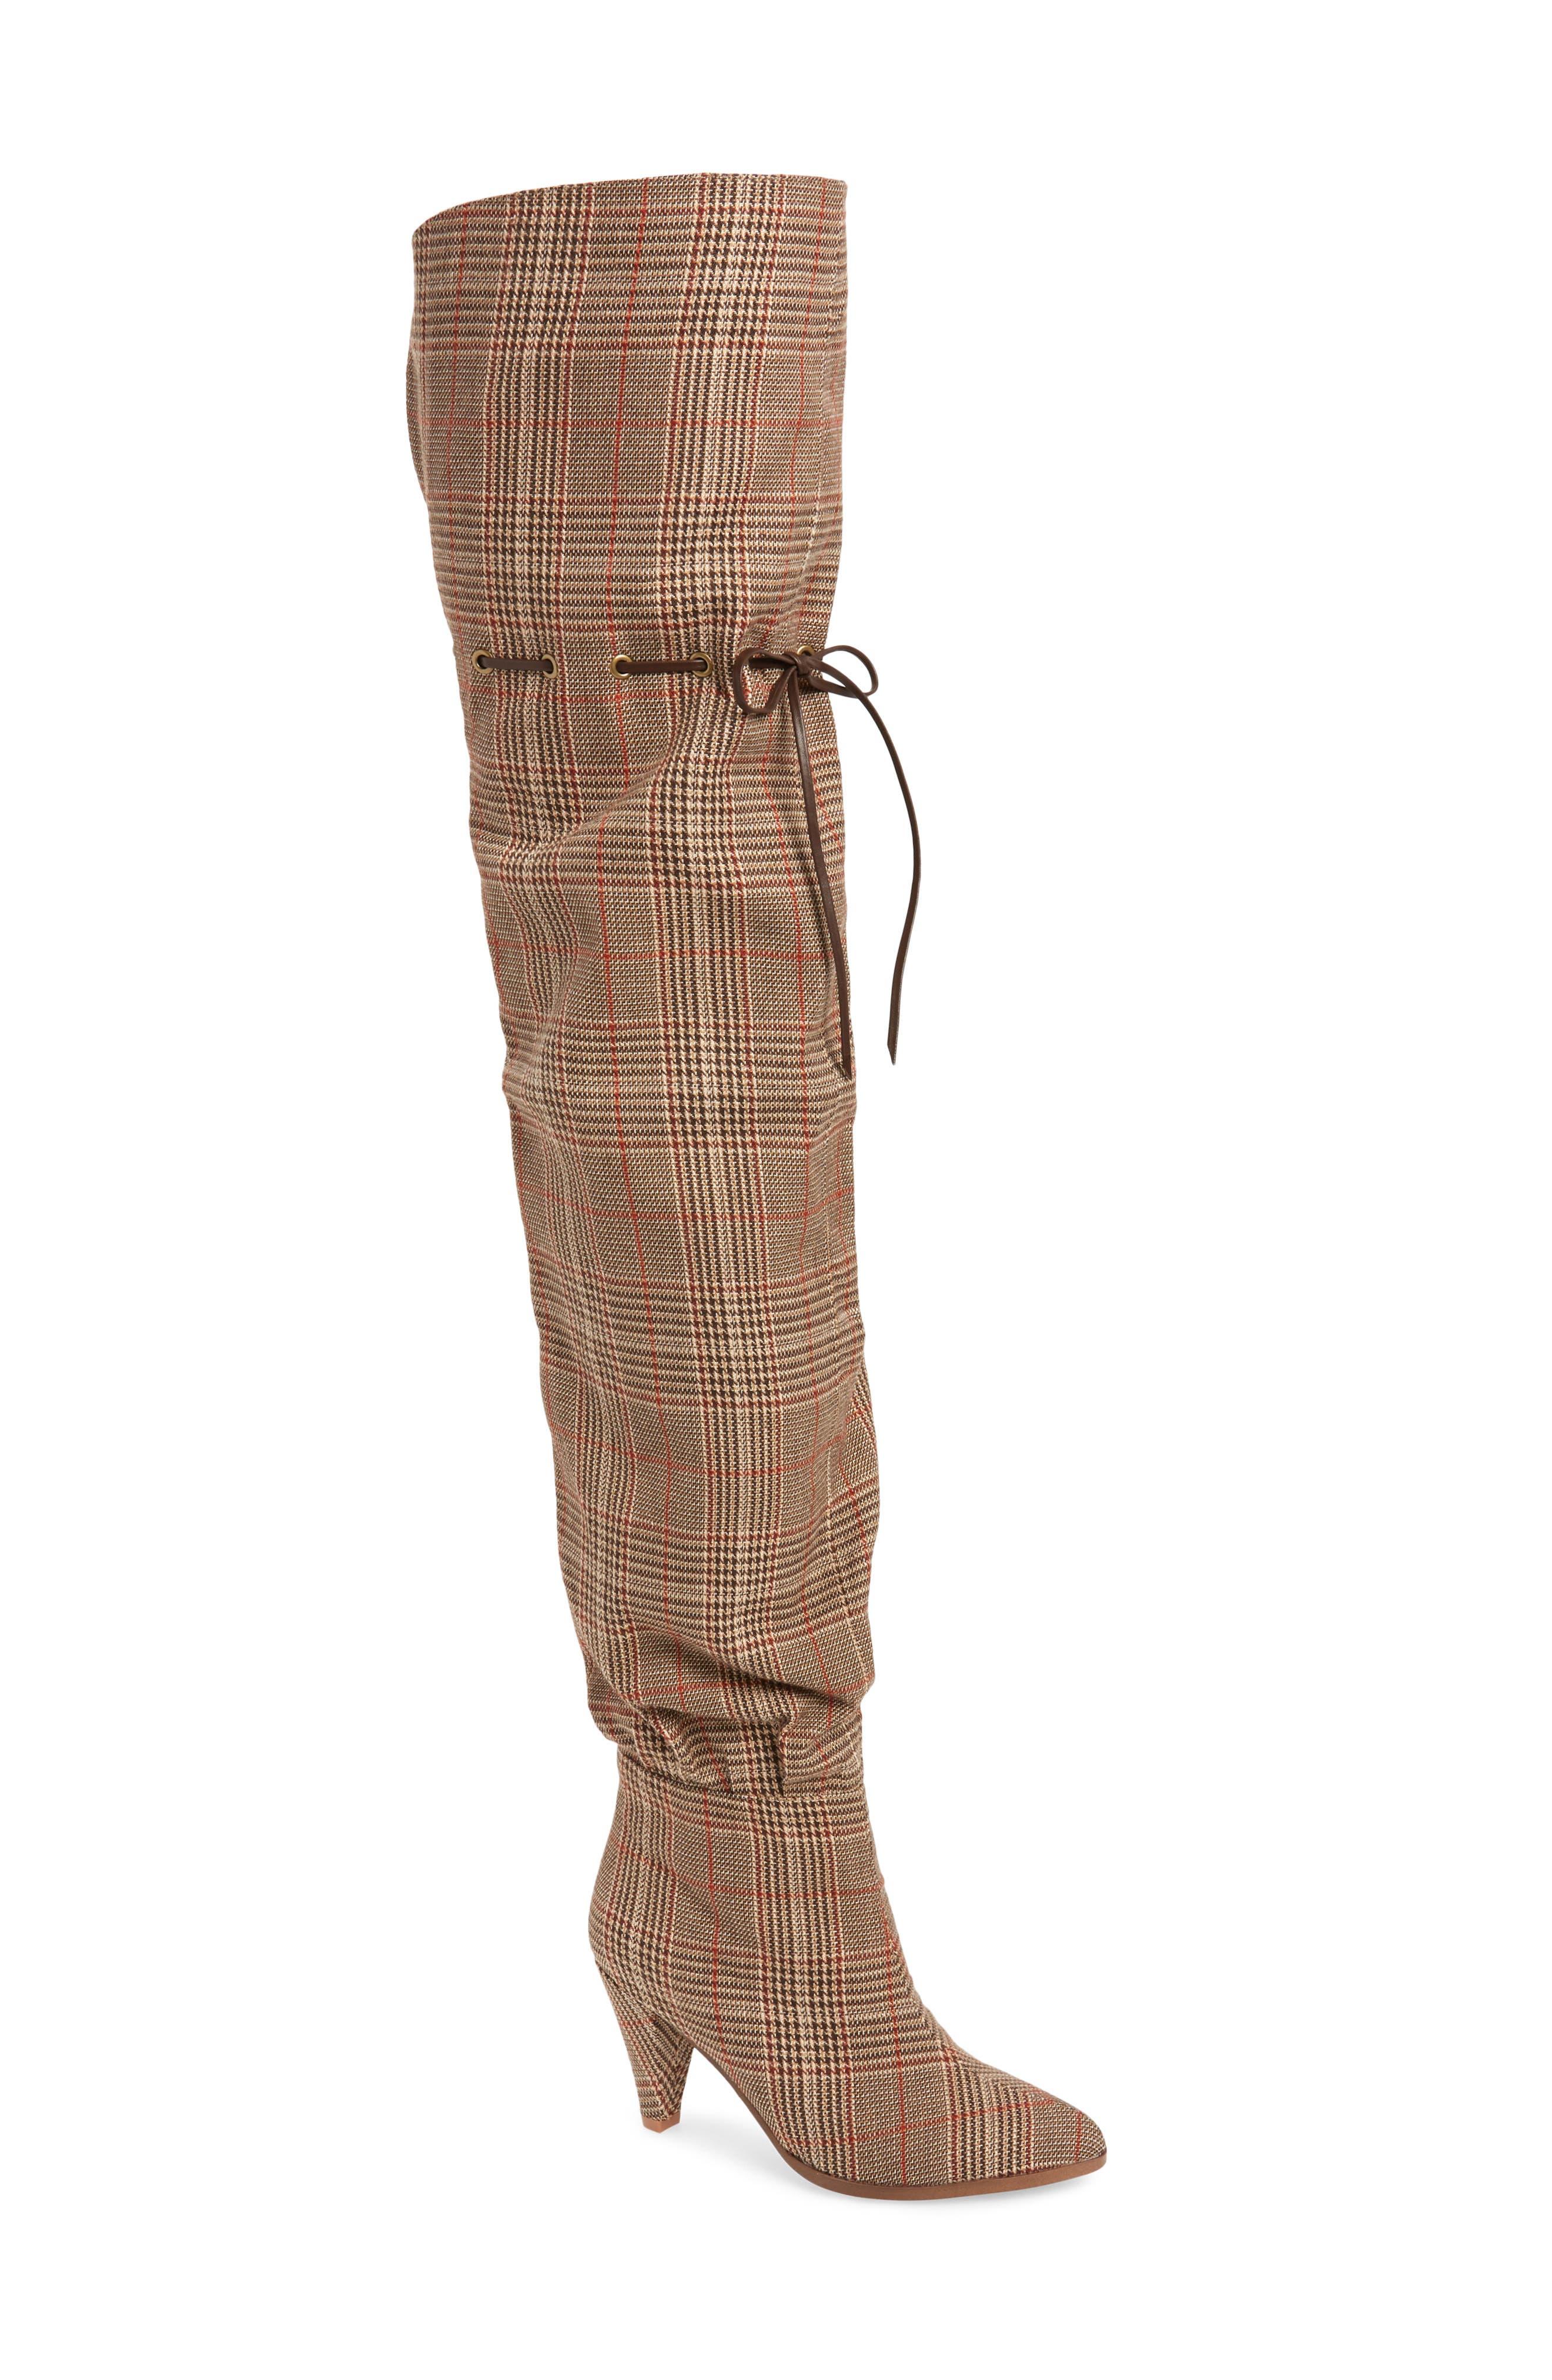 Go-Go-Girl Thigh High Boot,                         Main,                         color, BEIGE PLAID